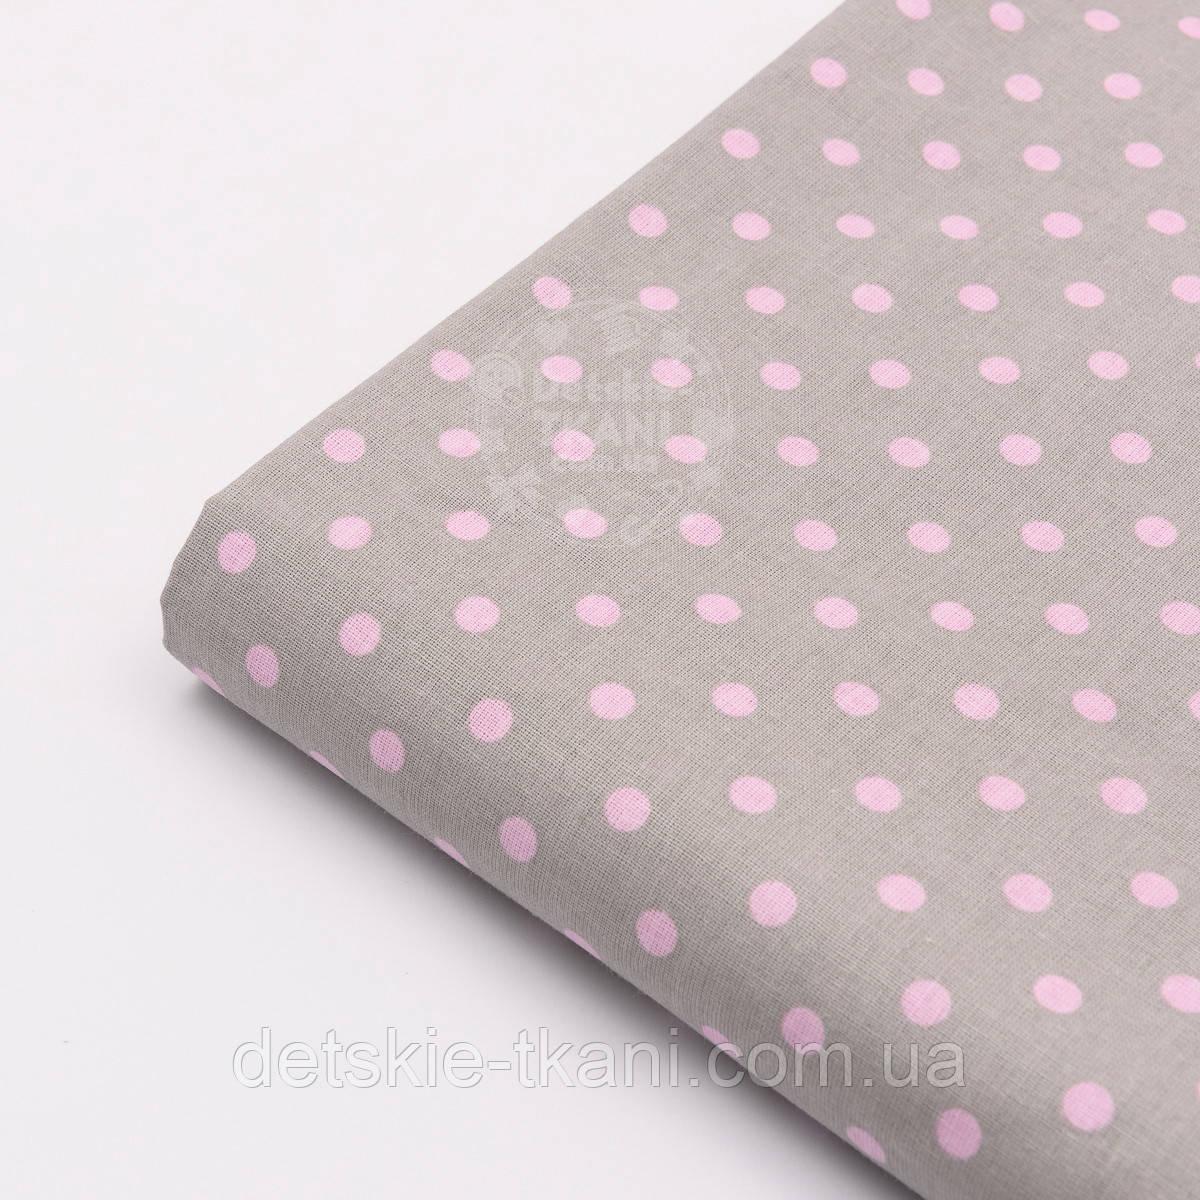 Отрез ткани №488 с розовым горошком 6 мм на сером фоне, размер 53*160